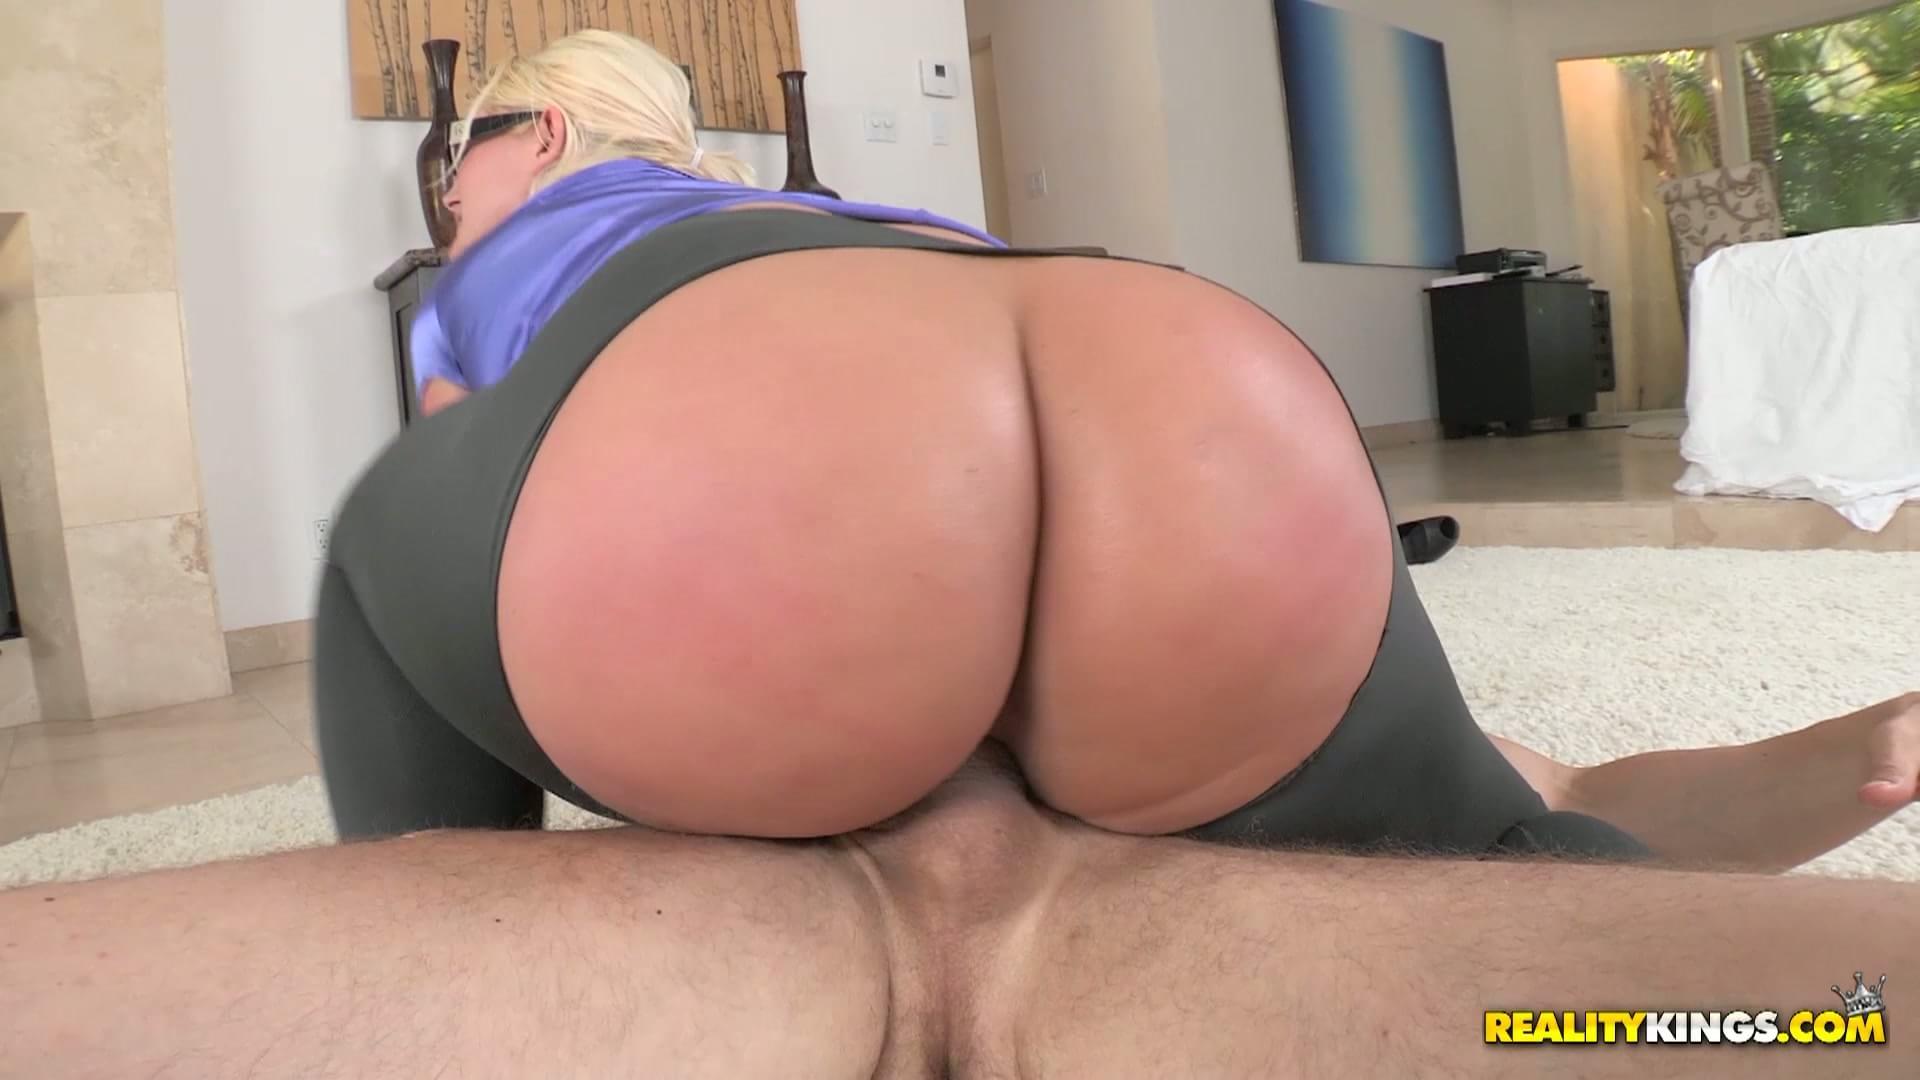 Julie cash bounces her big ass riding on xander's hard cock